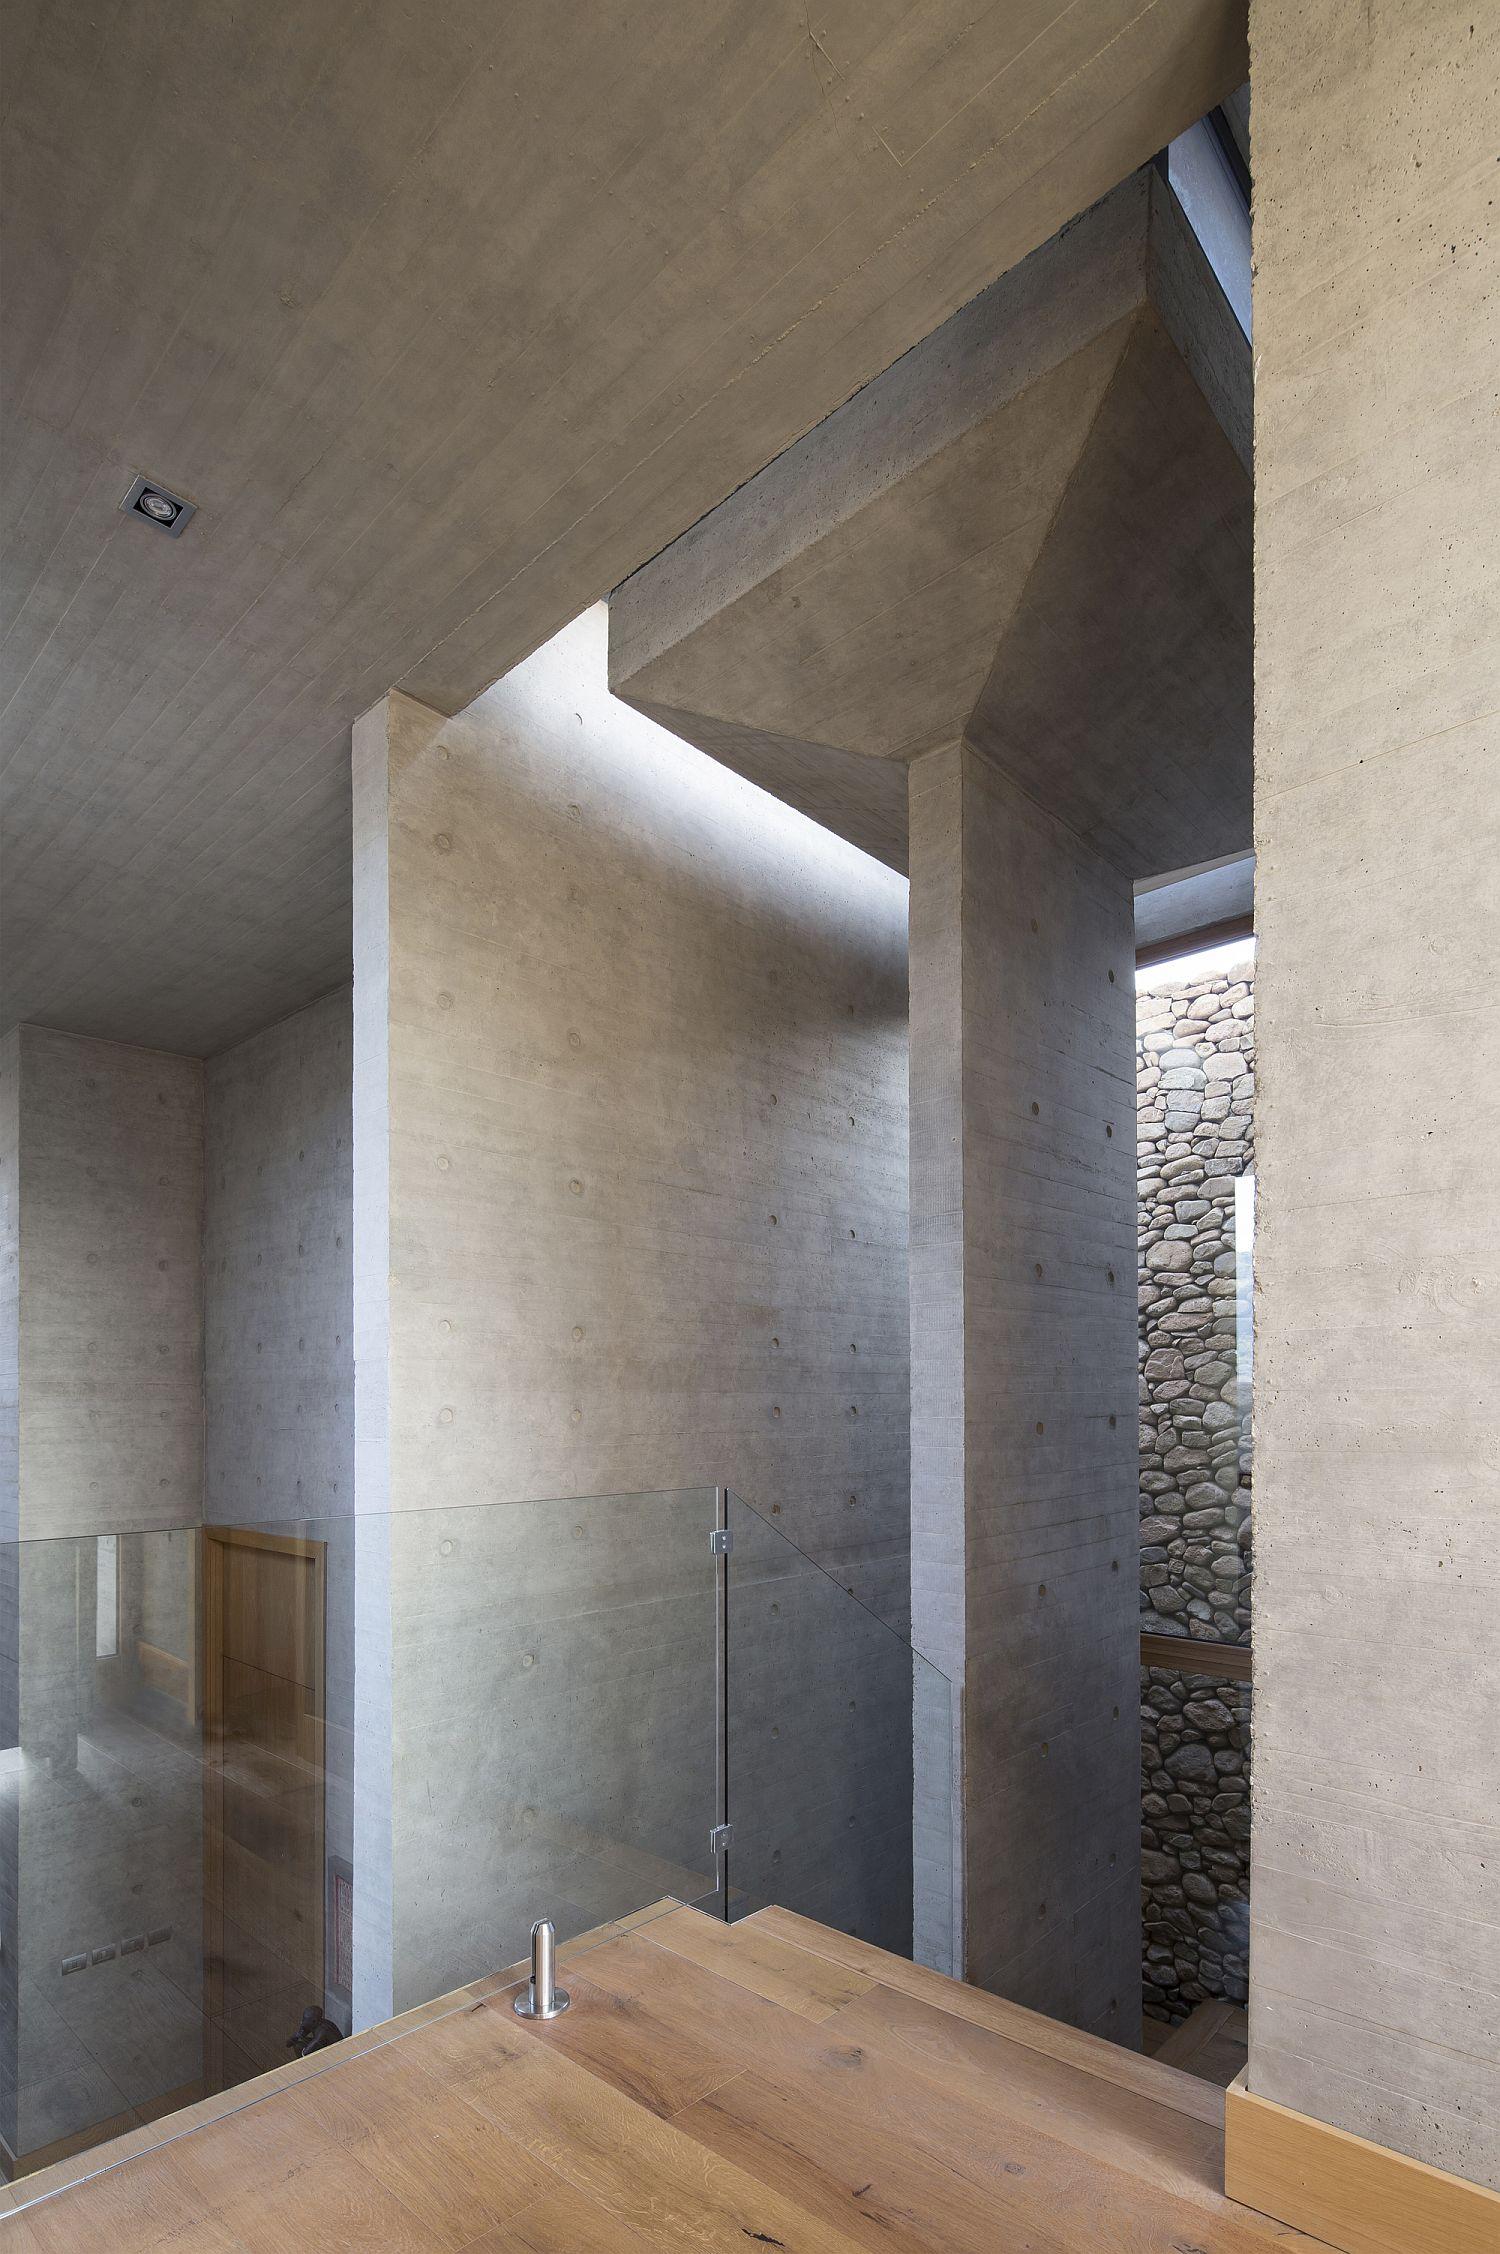 Smart concrete interior of the house